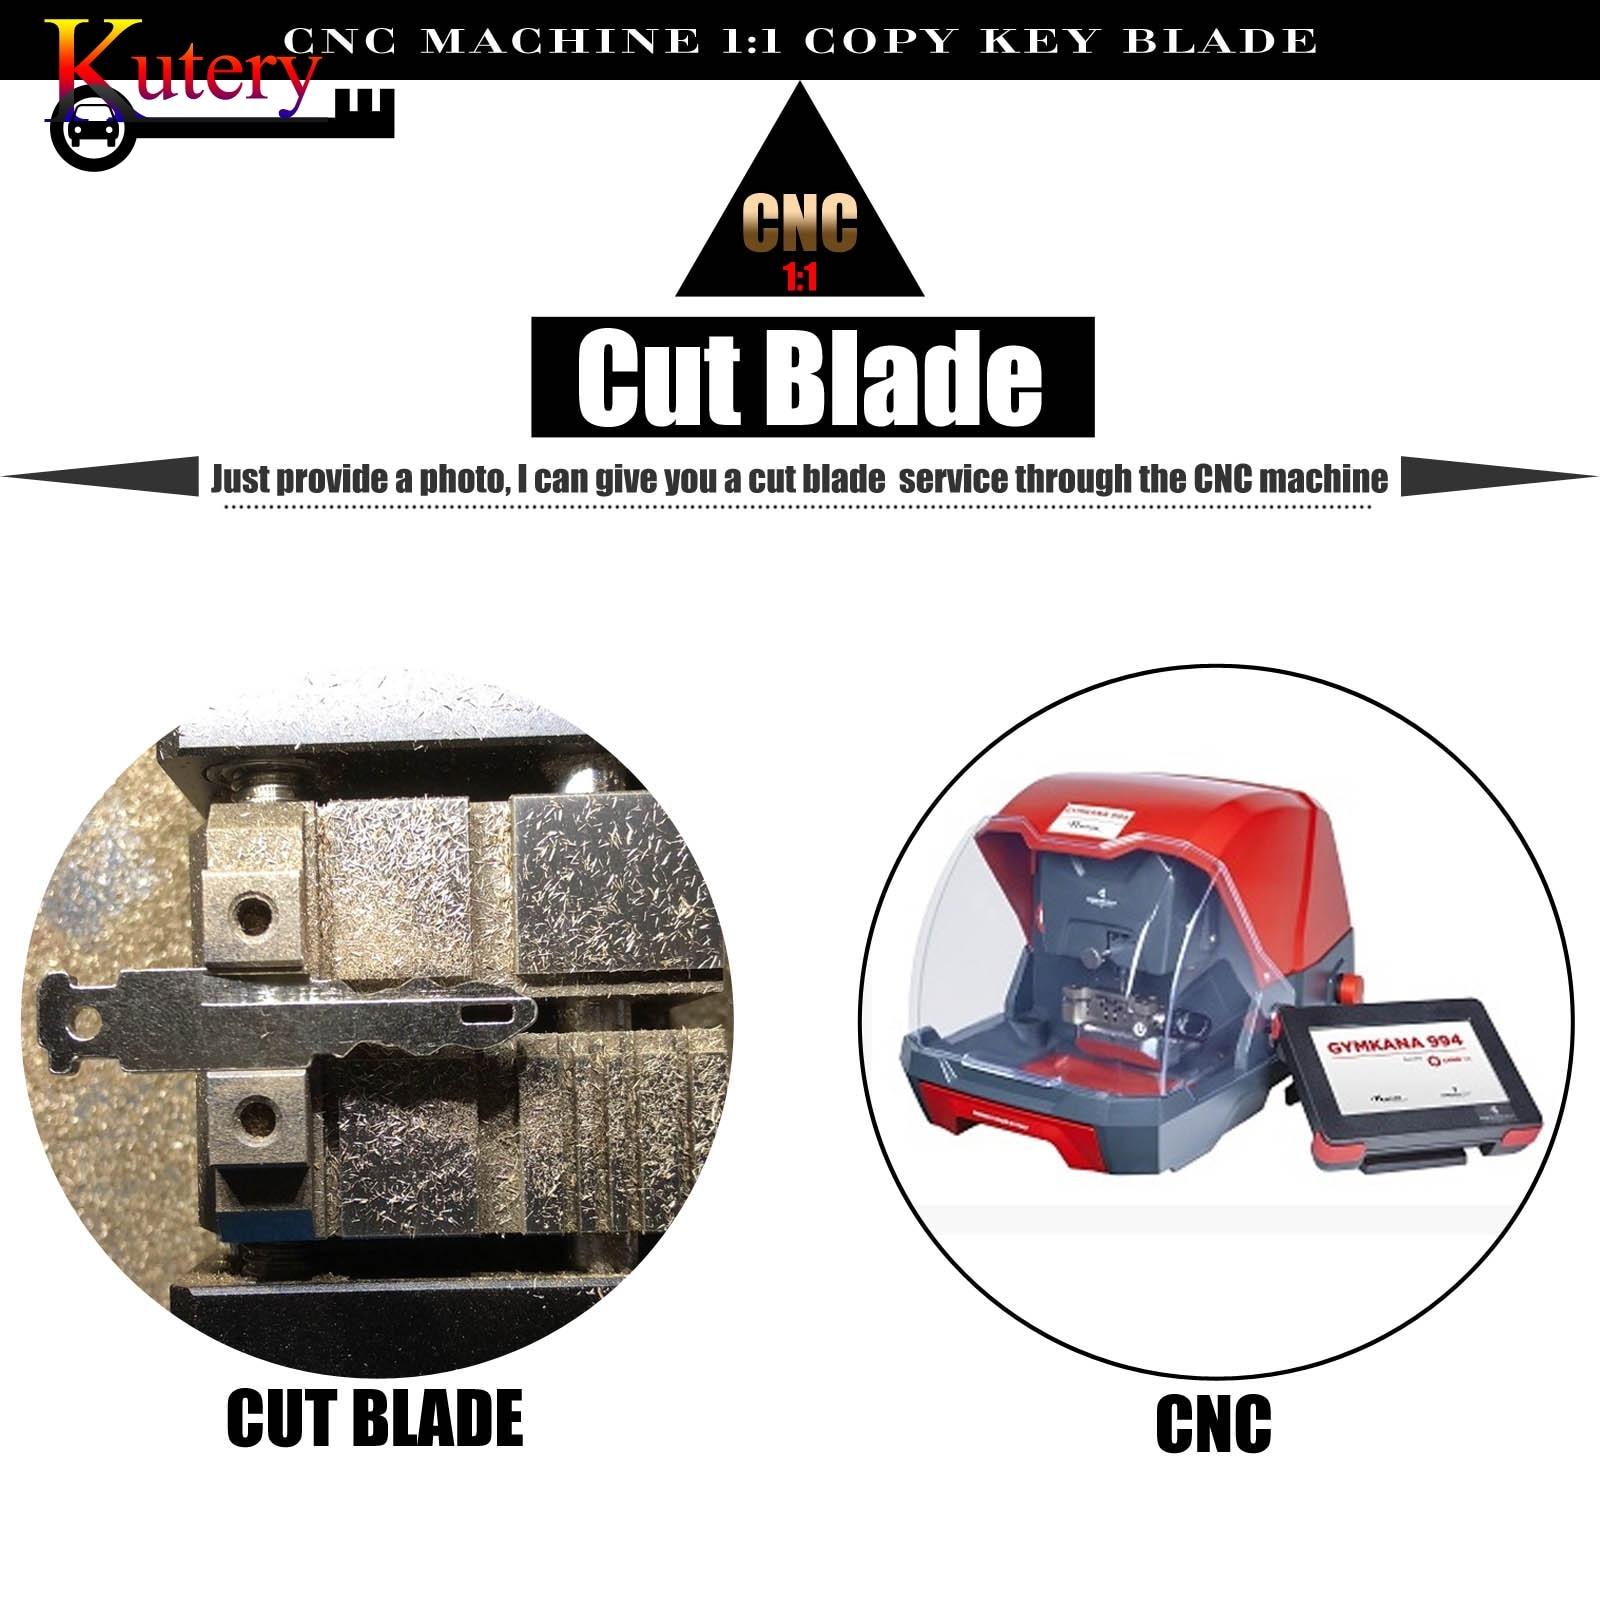 kutery CNC cut blade copy blade cut car key Service fee for vw Toyota Peugeot ford Audi Hyundai kia Honda chevrolet renault C